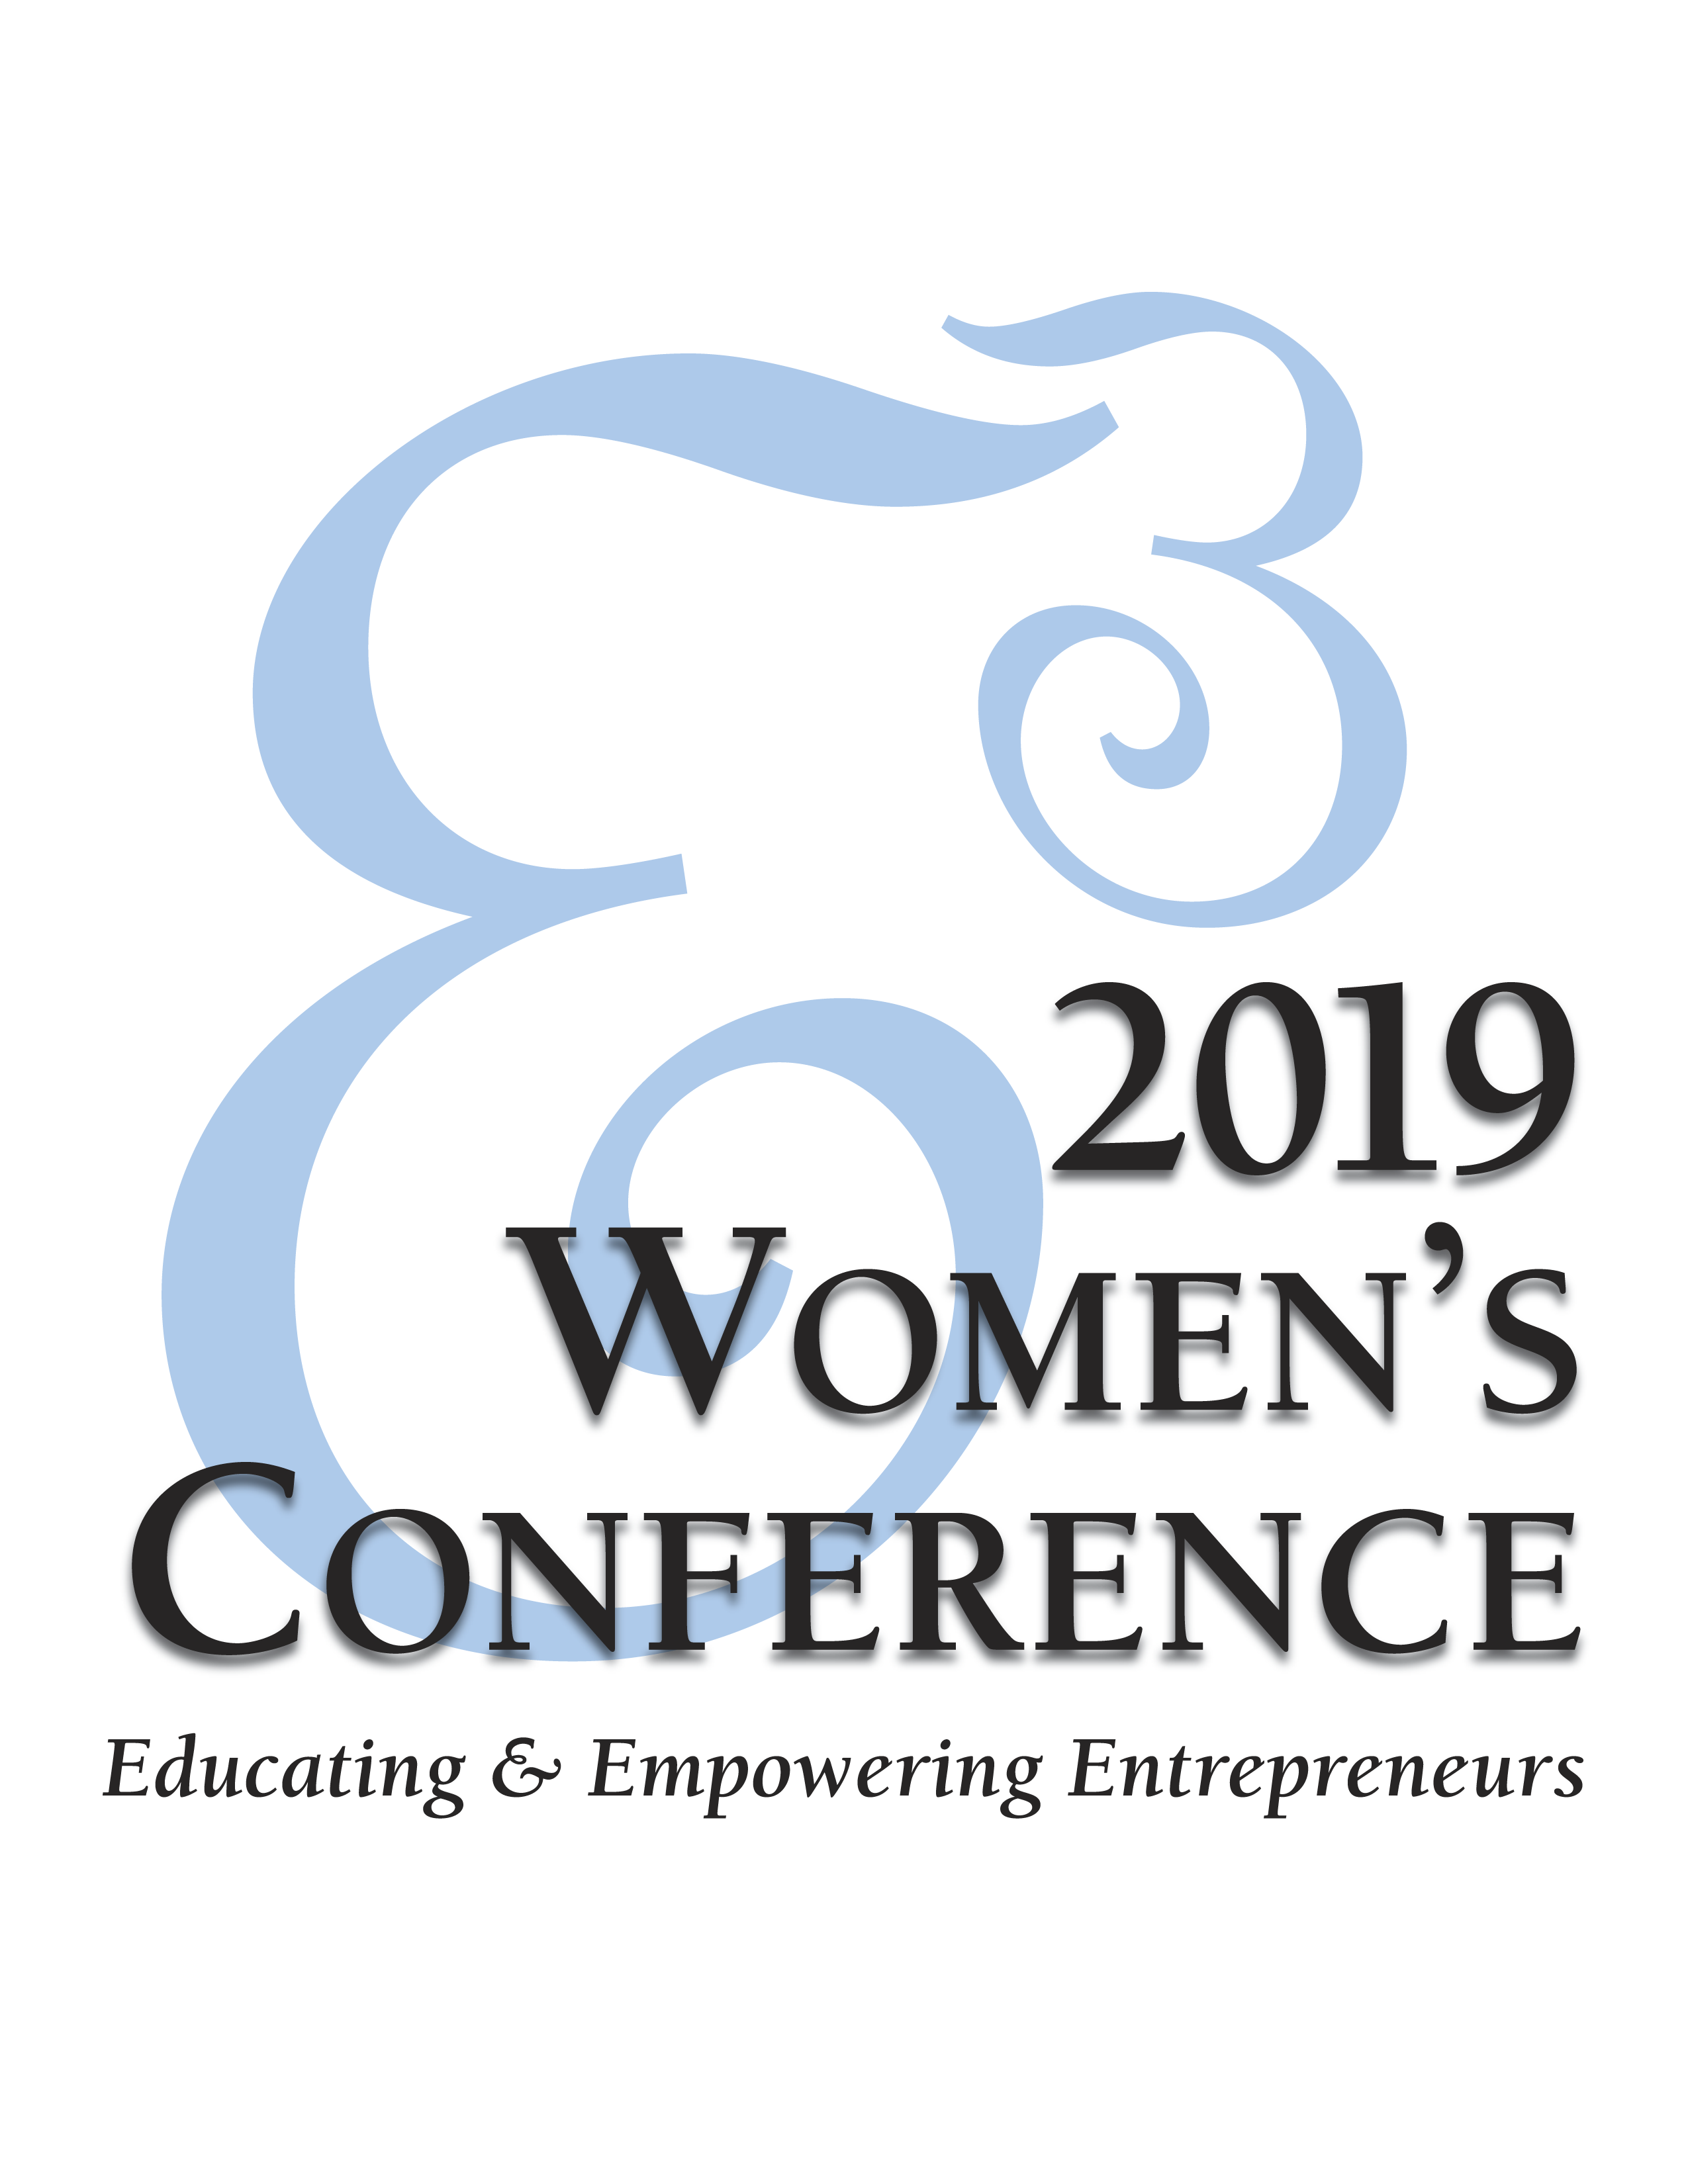 E3 Women's Conference in Springfield, MO